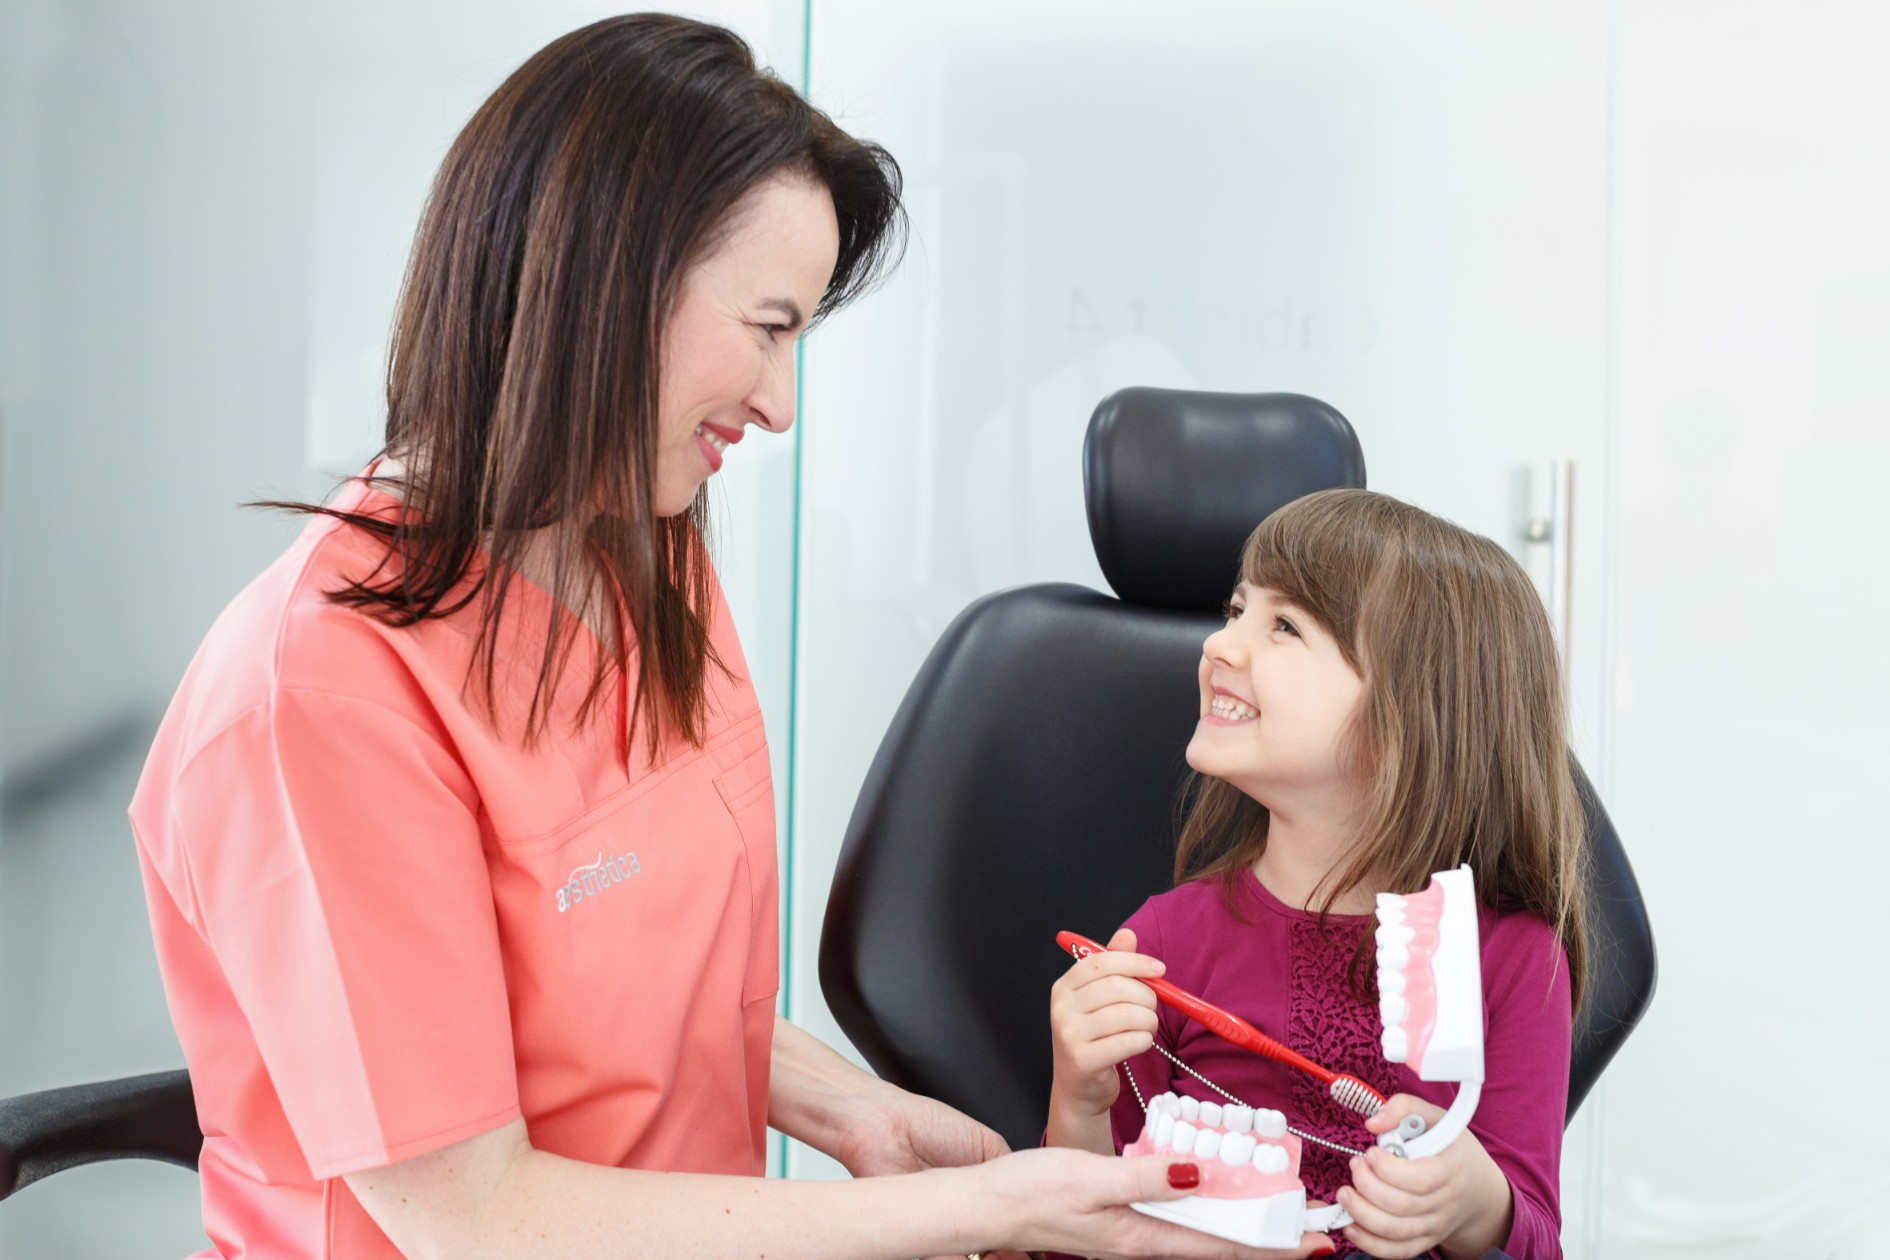 teama de dentist la copii, stomatolog pentru copii, clinica Aesthetica, clinica stomatologica Cluj